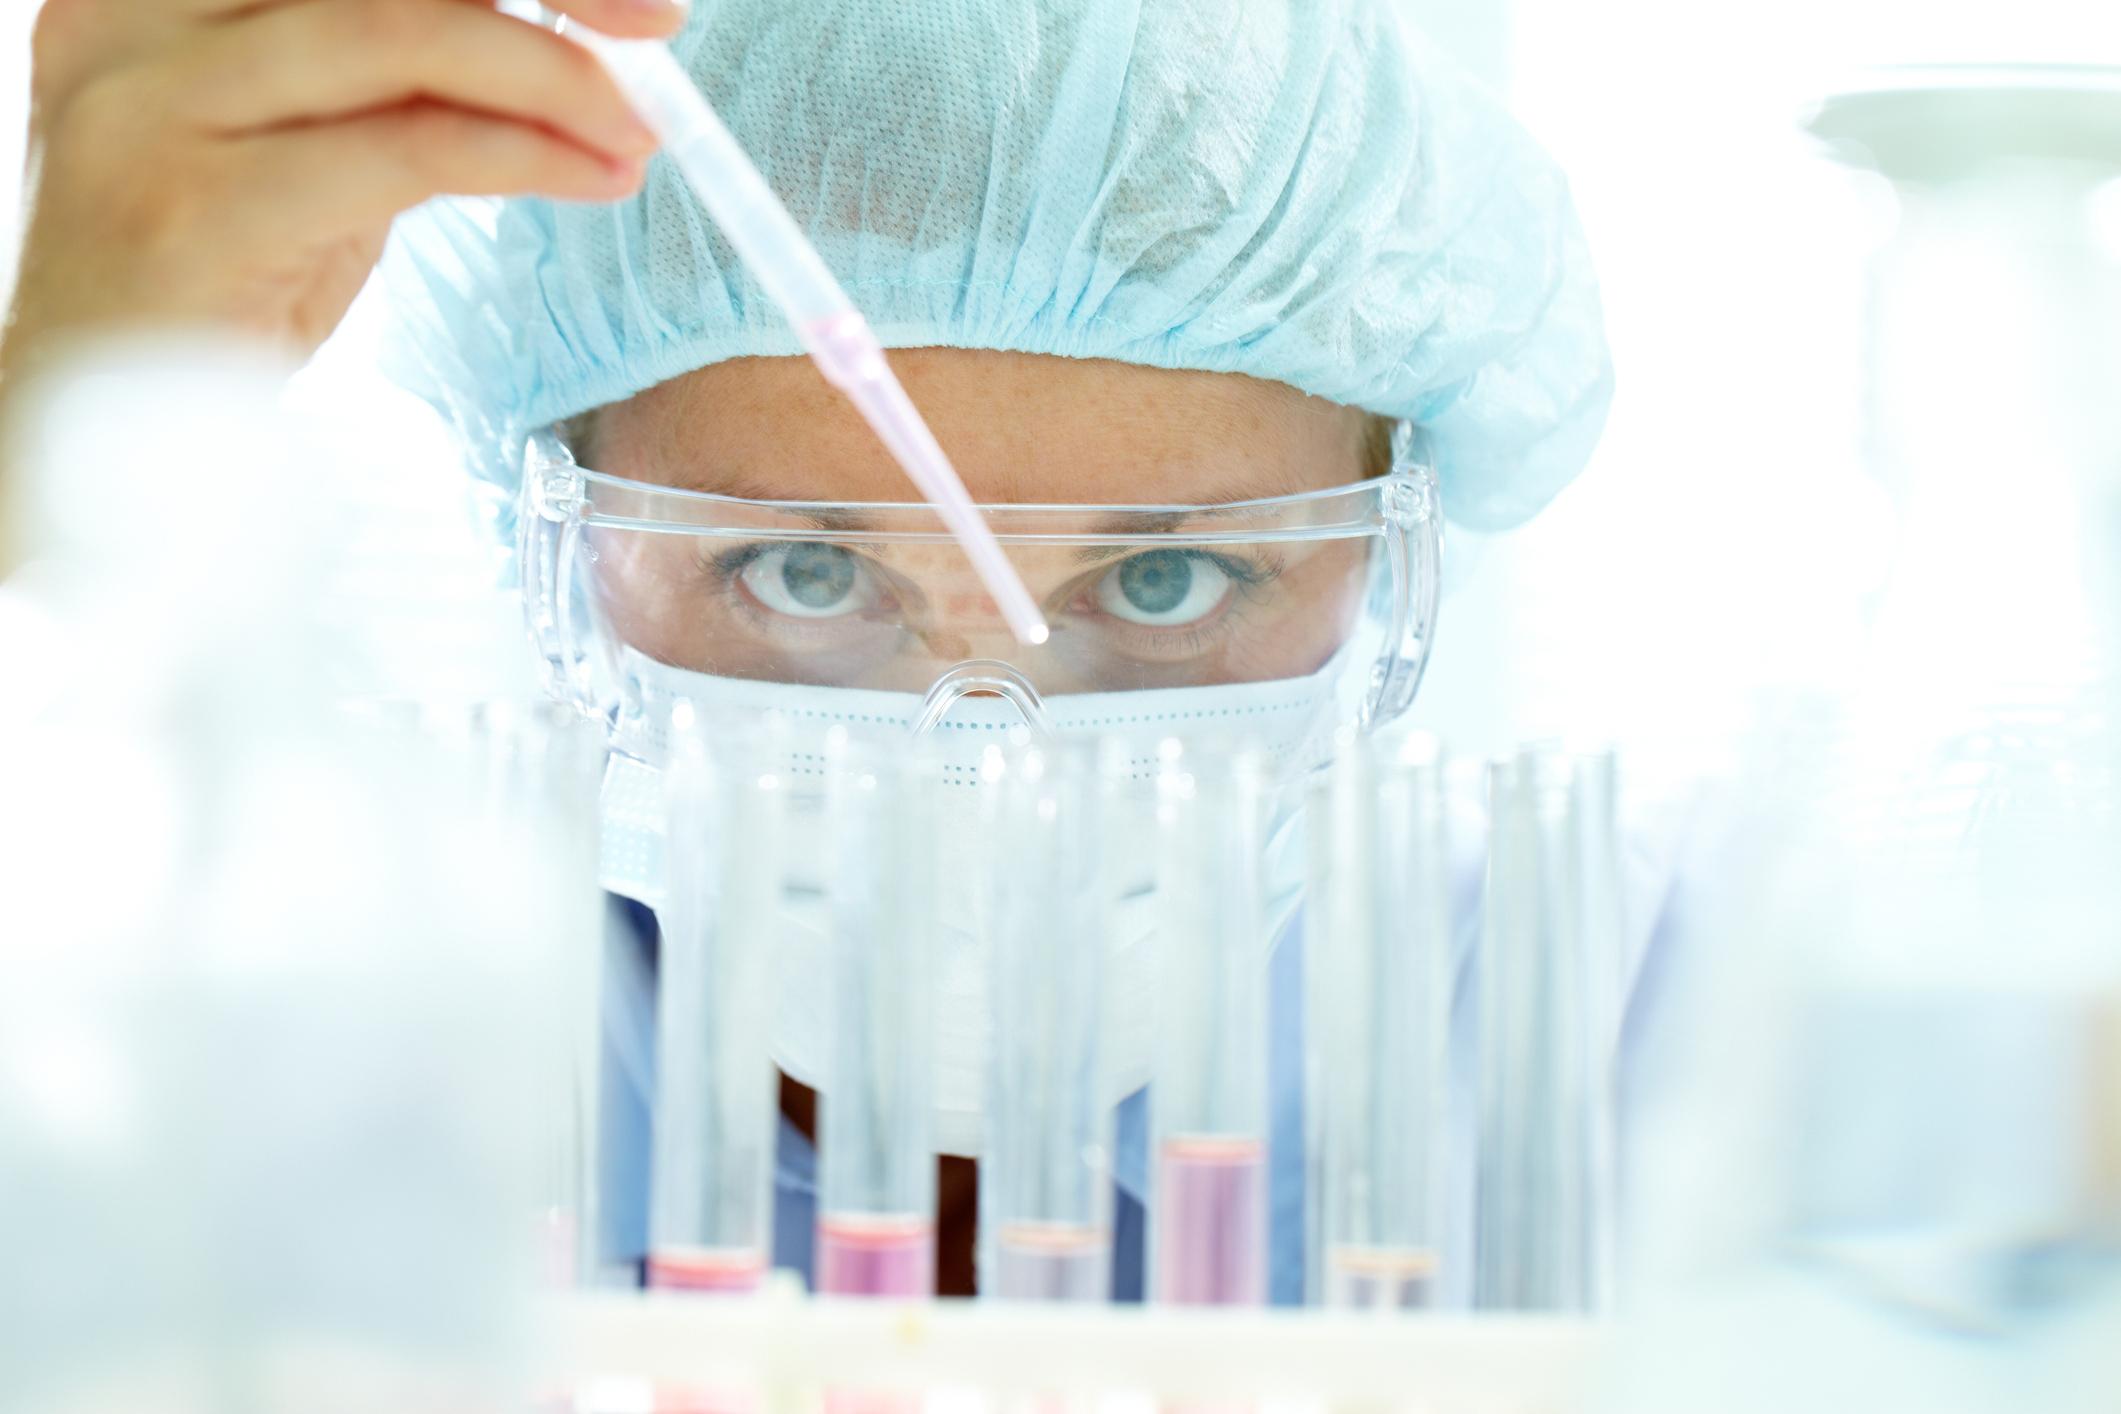 A pharmaceutical lab tech using a dropper.